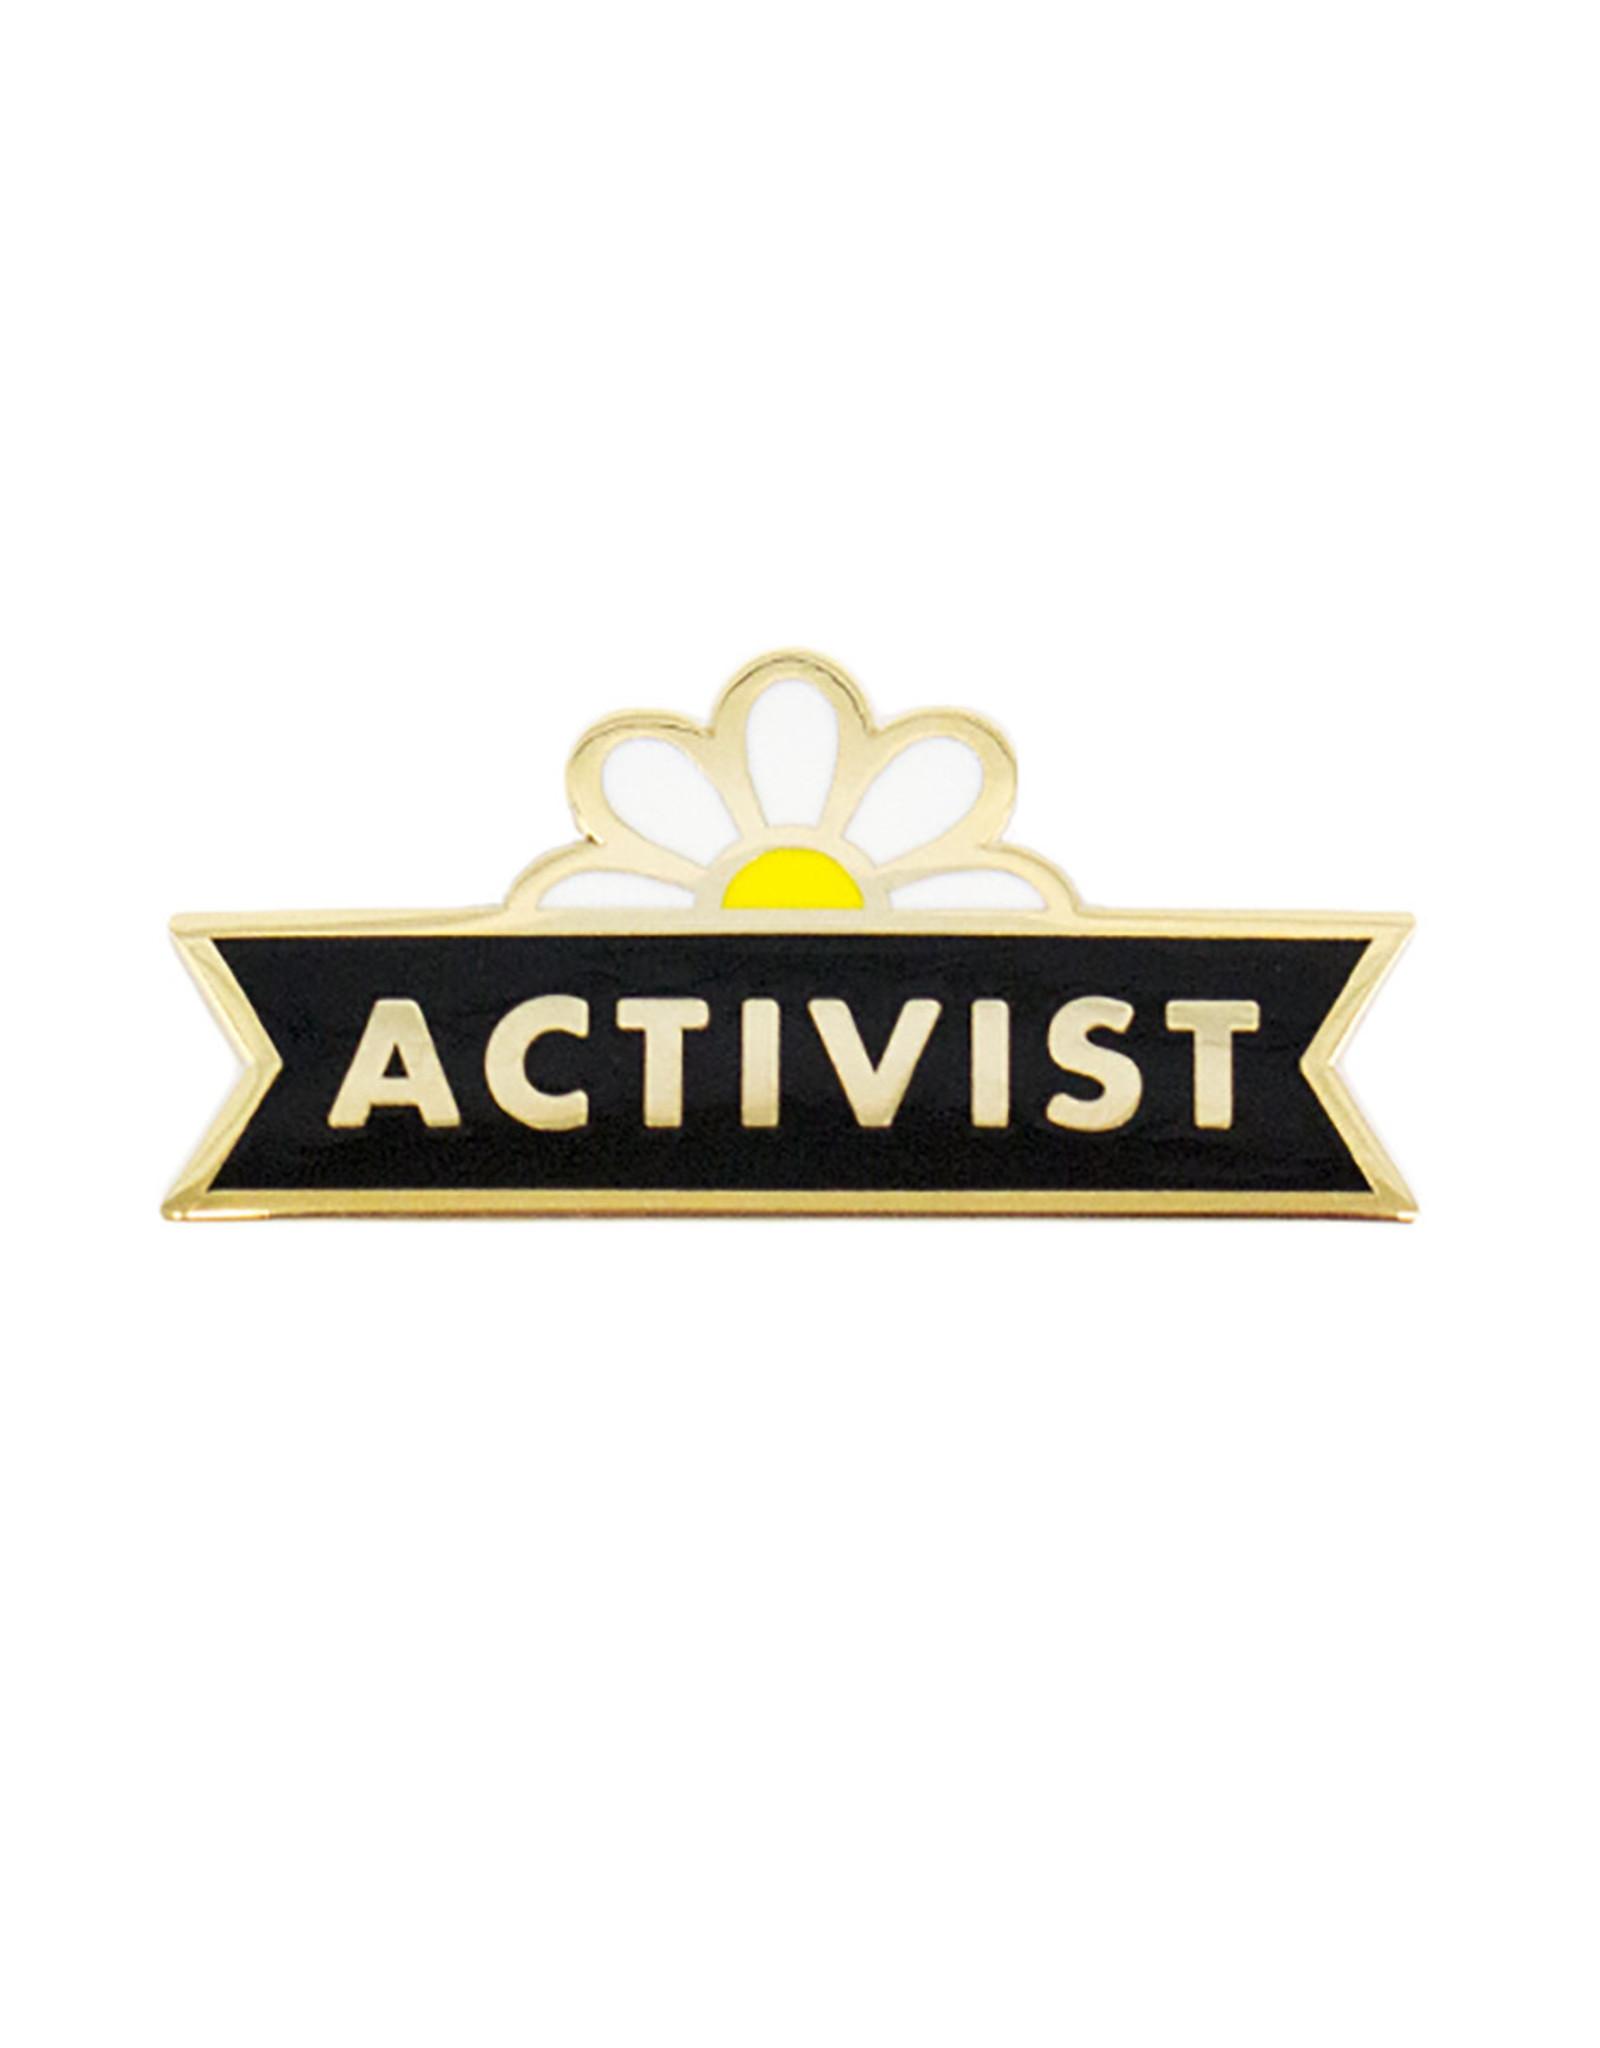 Enamel Pin - Activist